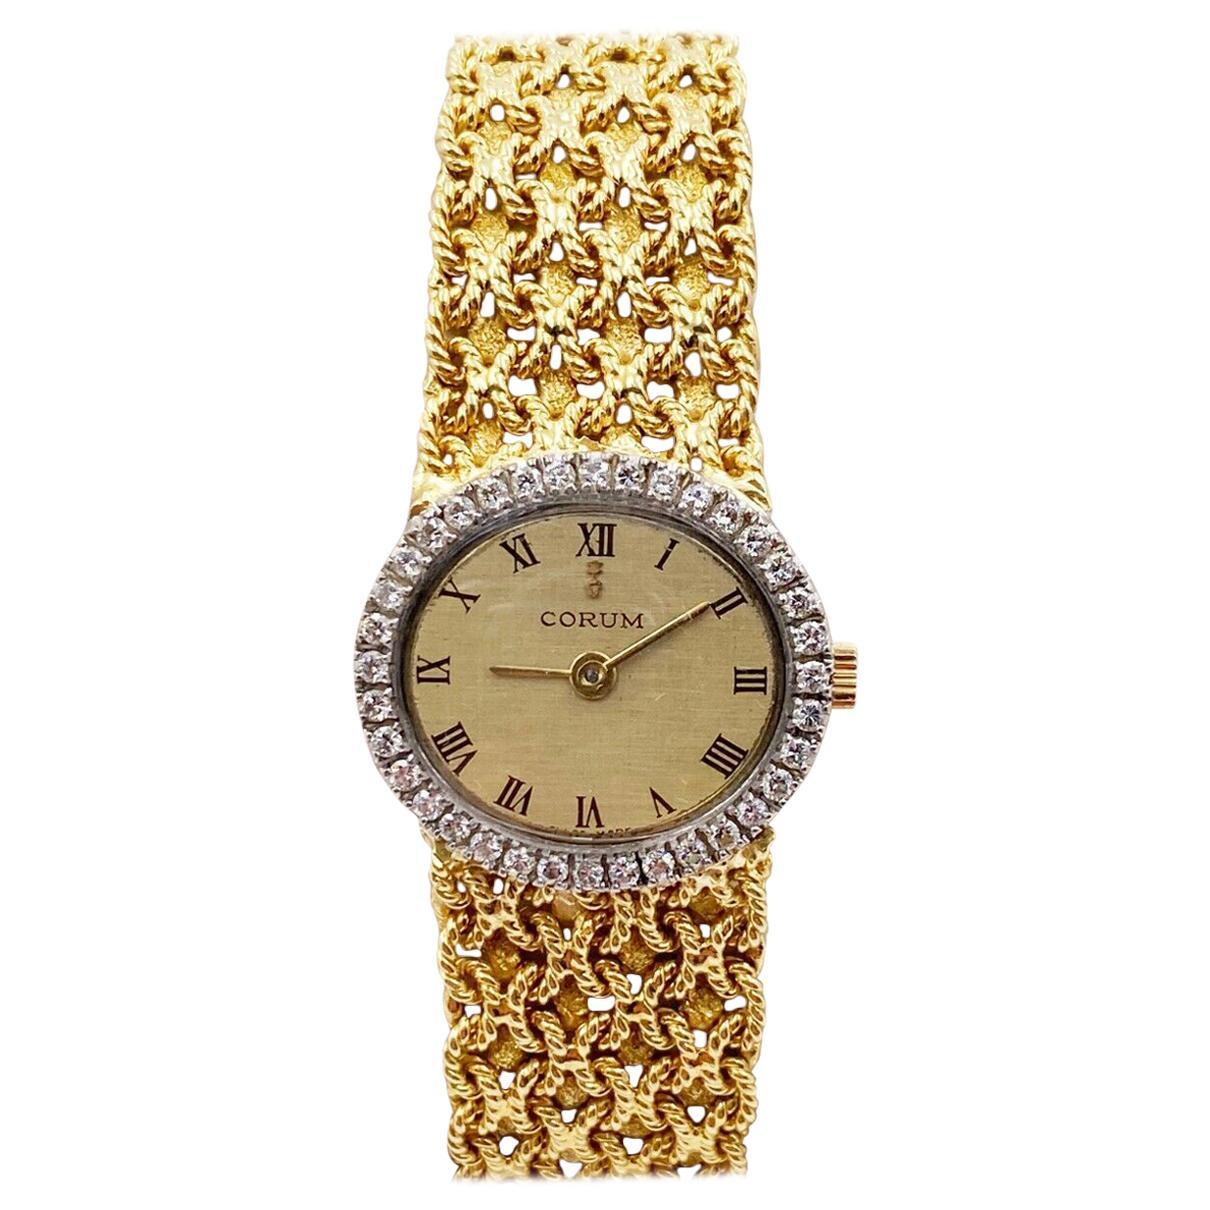 Corum Ladies Diamond Bezel 18 Karat Yellow and White Gold Watch